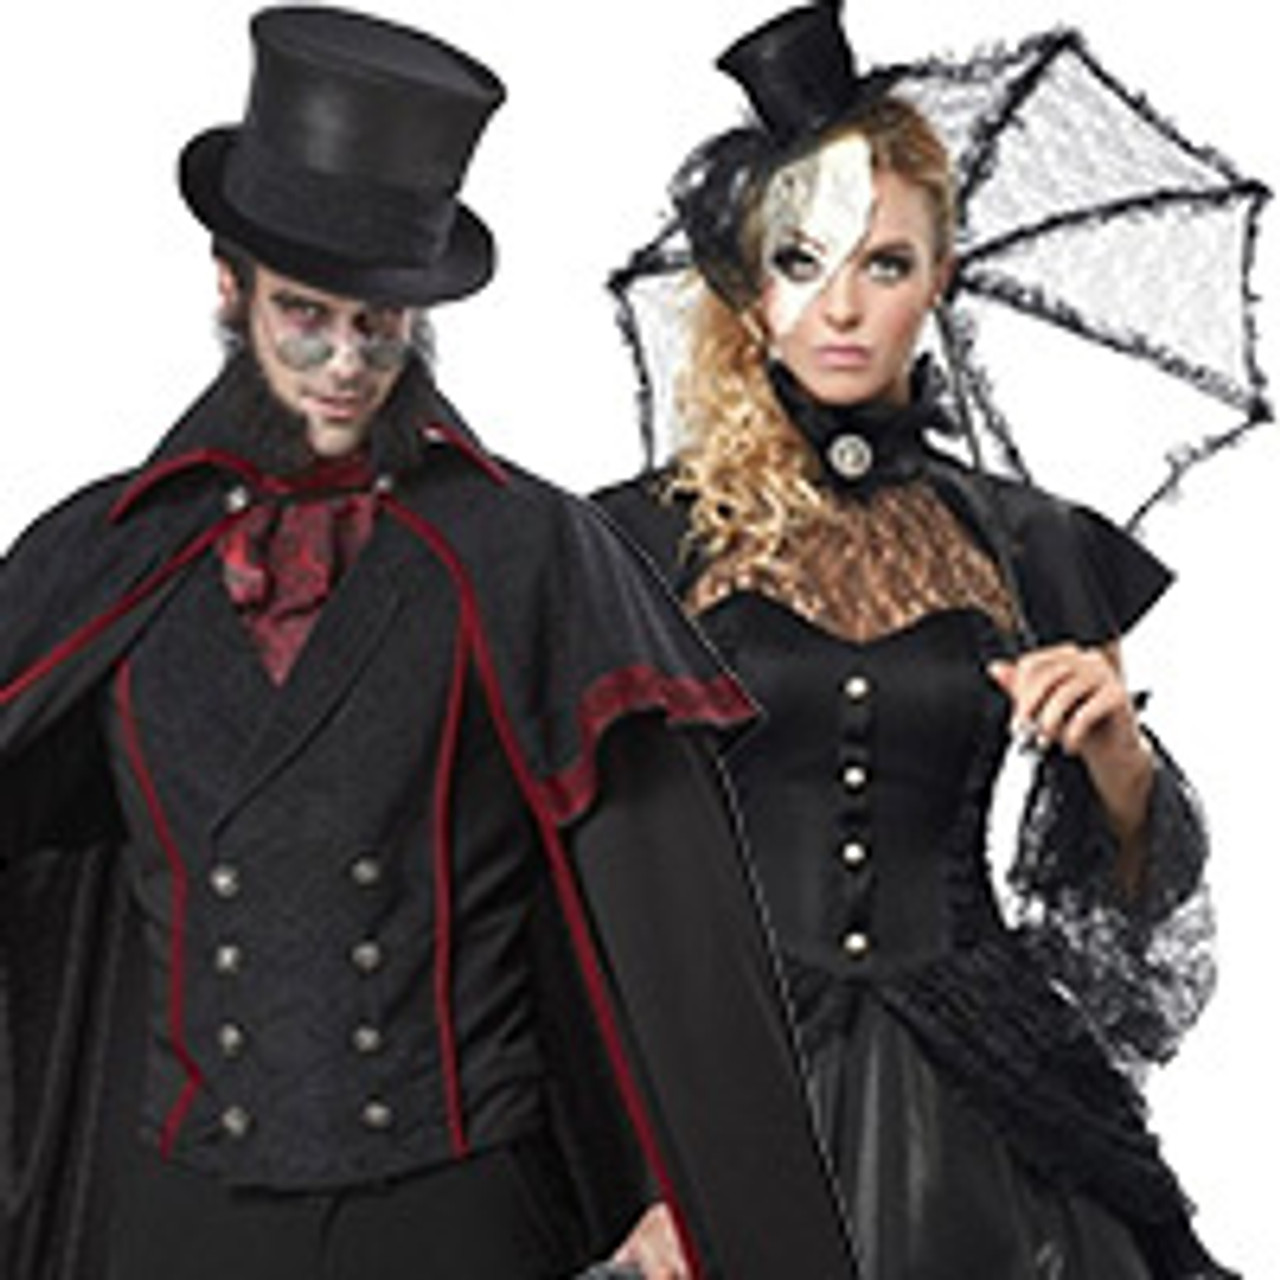 343d06a3d870e Halloween Costumes Australia | Extensive Range & Free Shipping